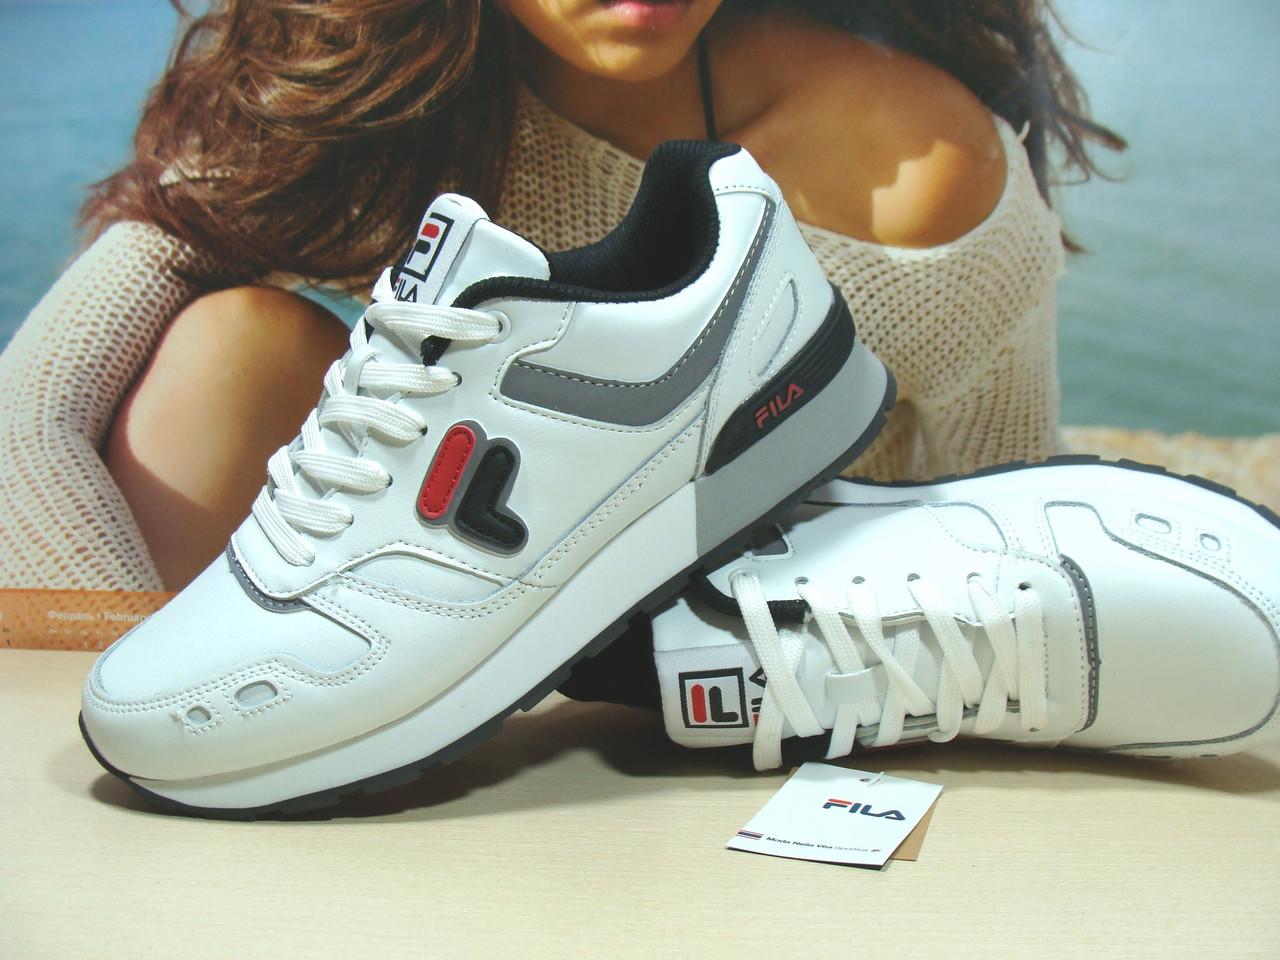 Мужские кроссовки Fila RJ STAR 85 (реплика) белые 42 р., фото 1